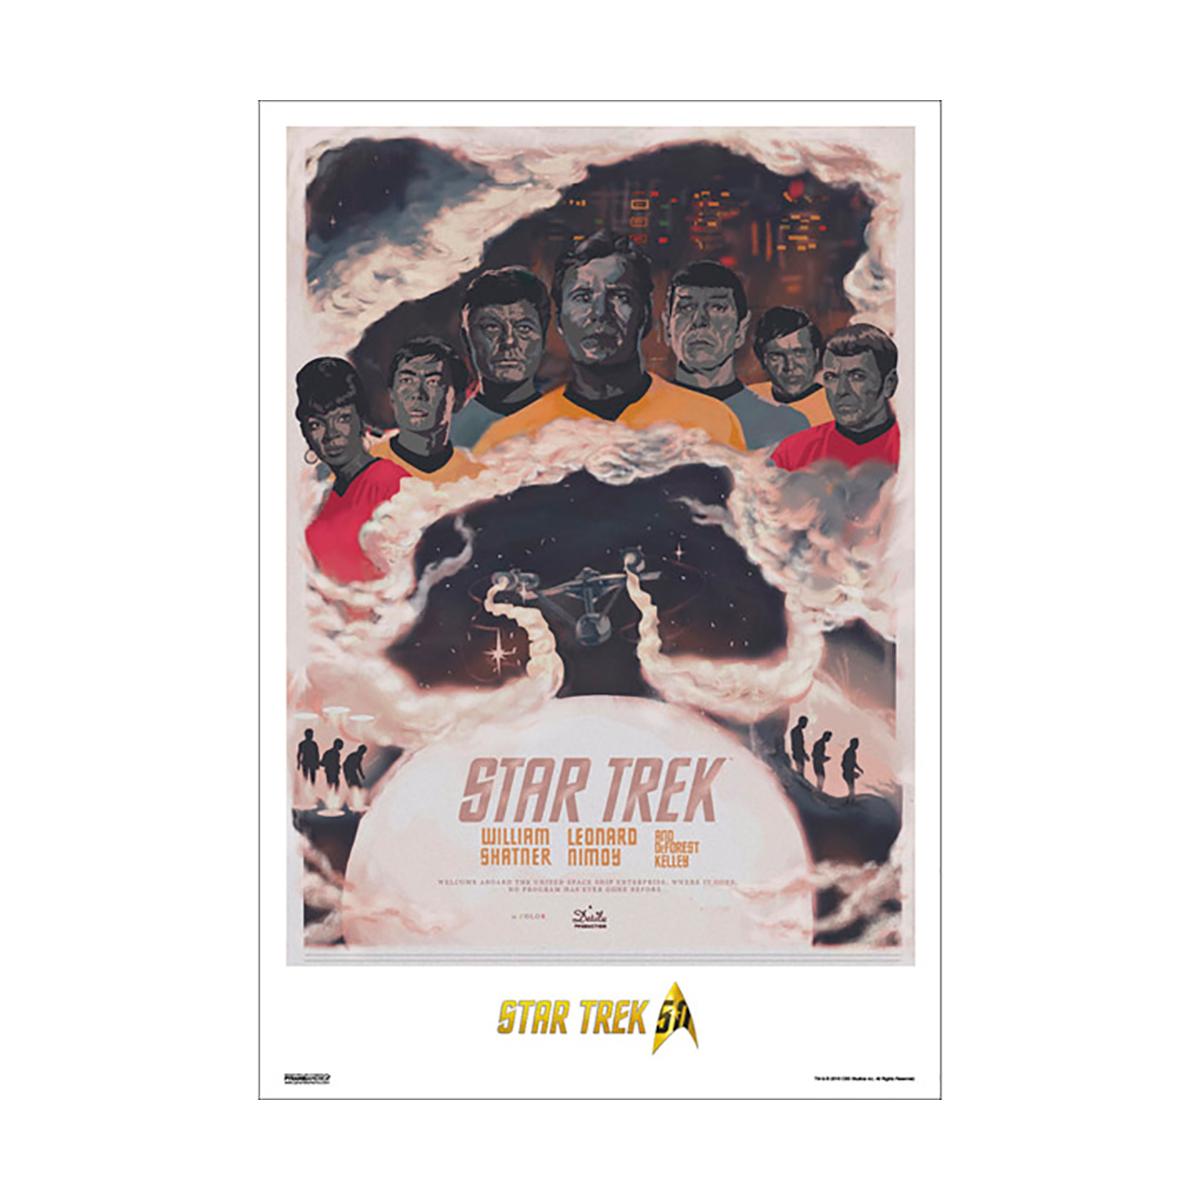 Star Trek 50th Art Collection NCC-1701 by Fernando Reza Poster [13 x 9]